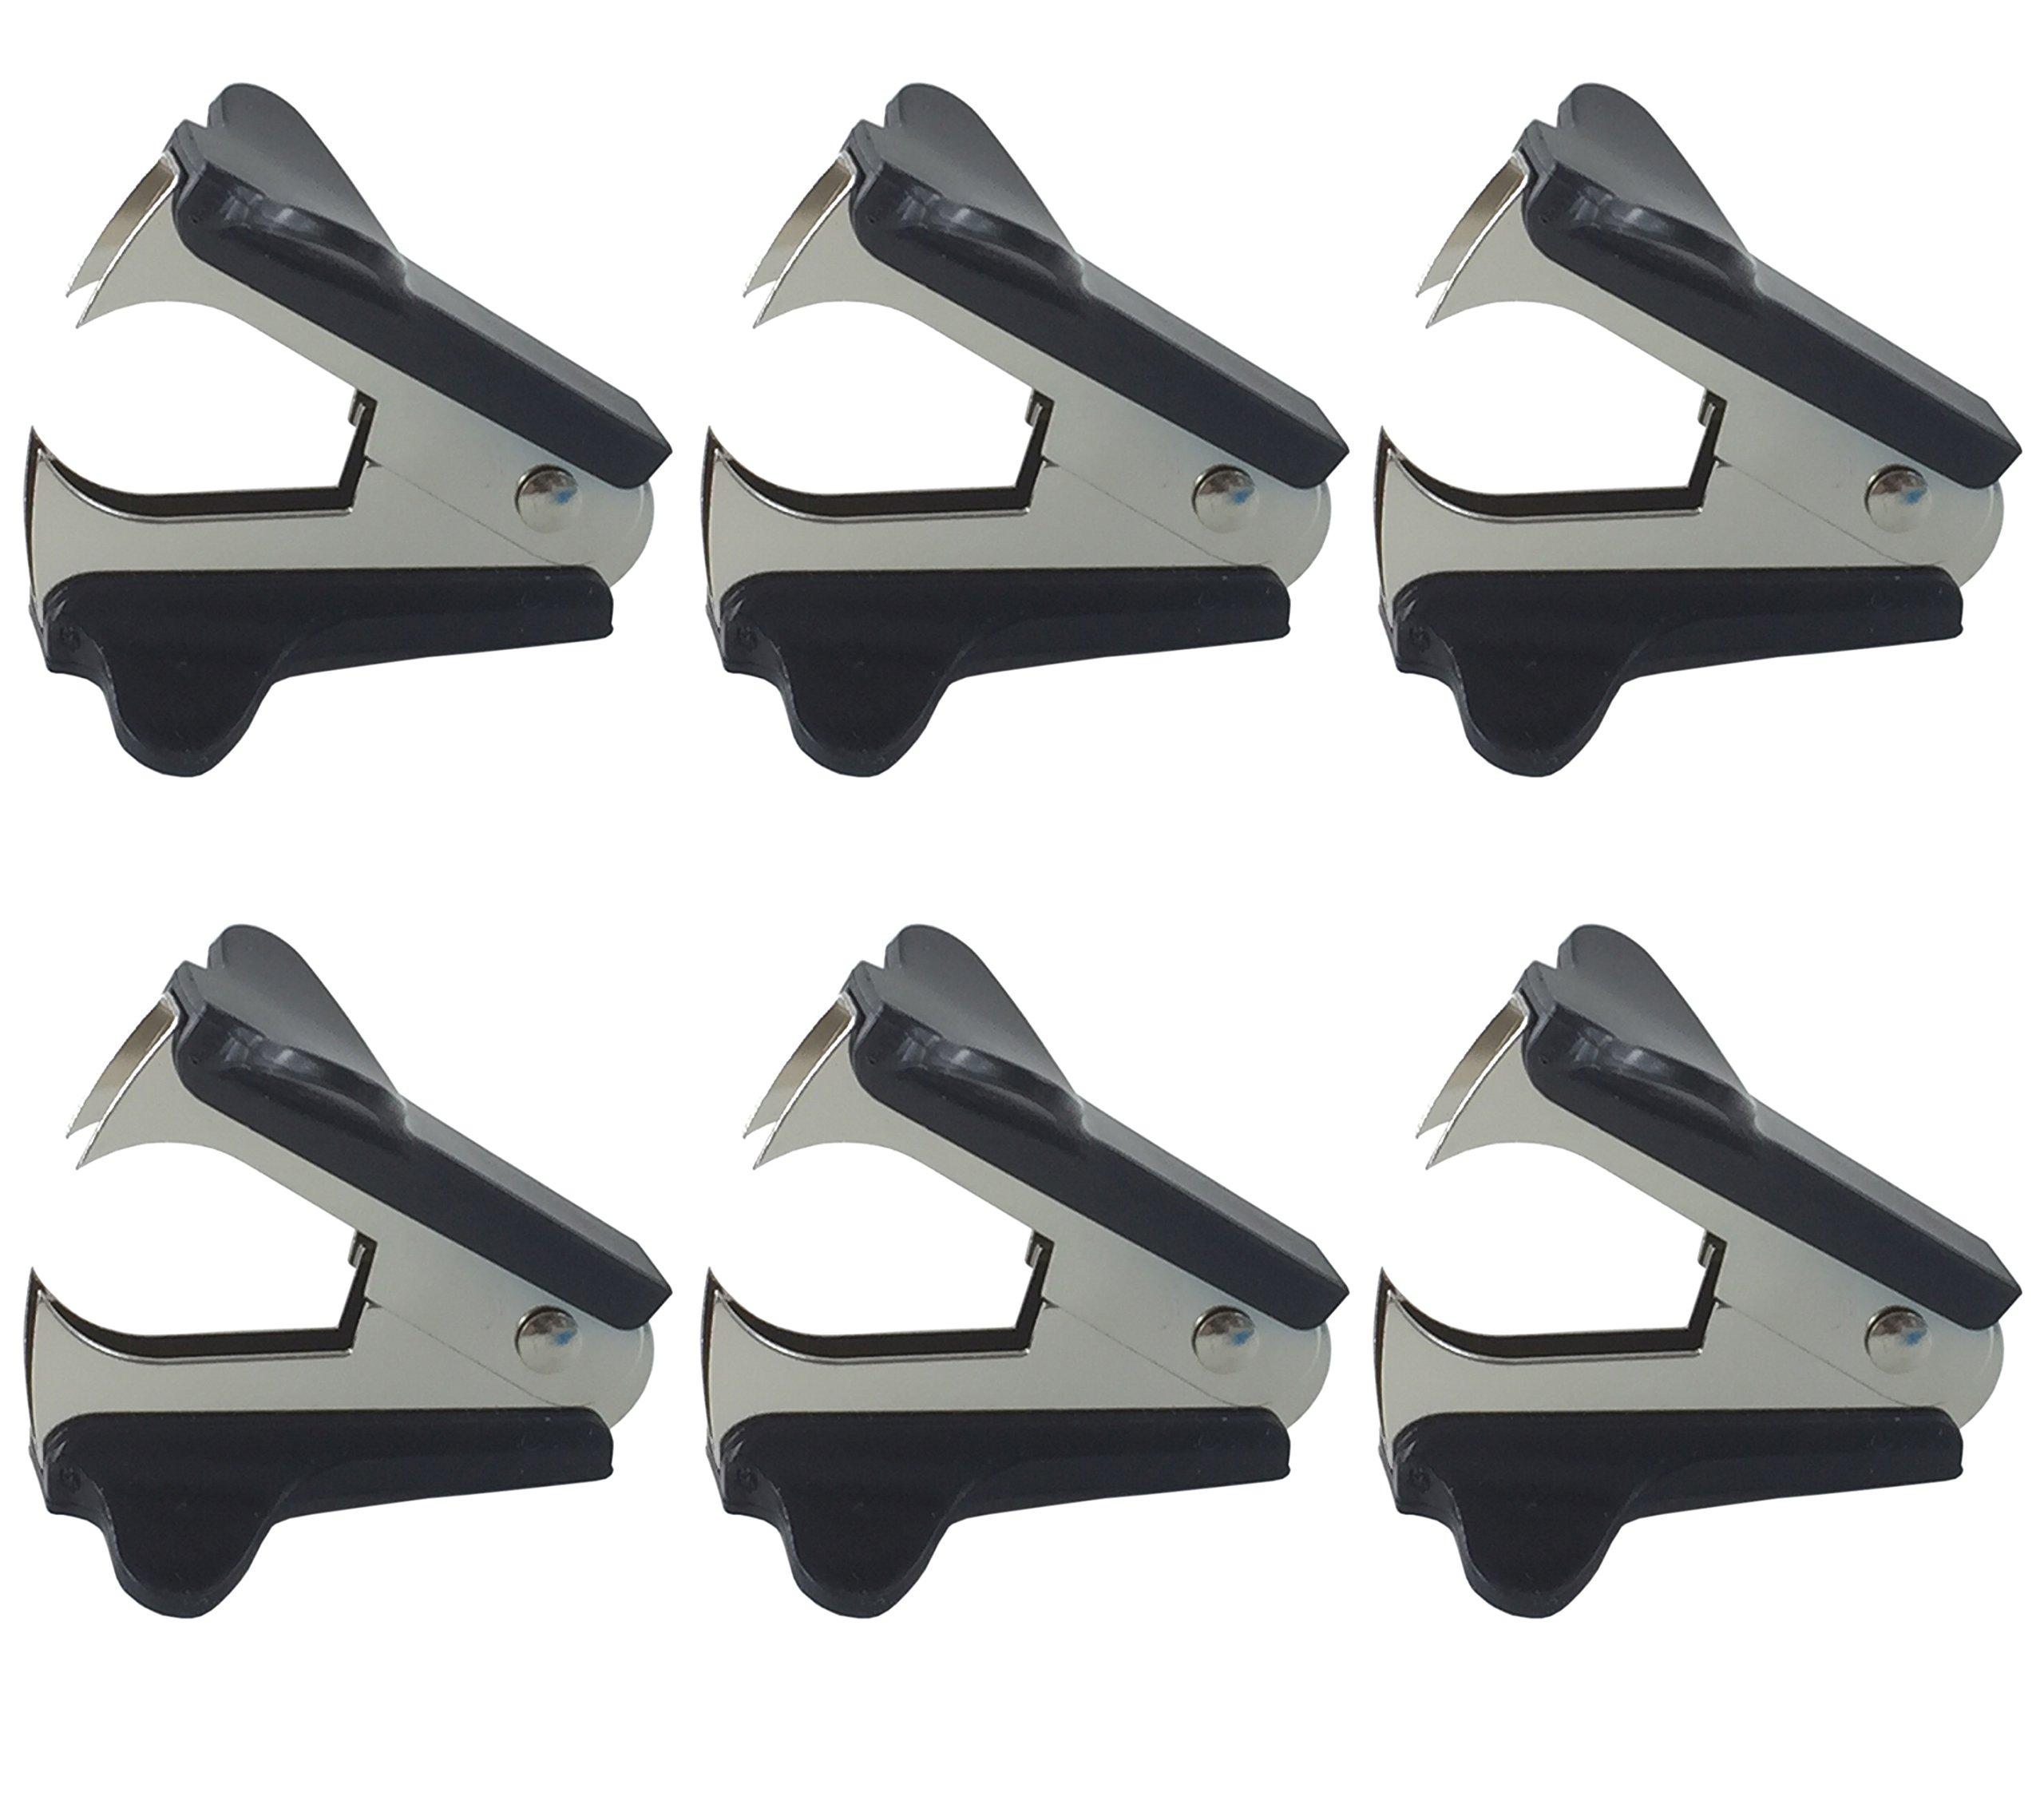 Clipco Staple Remover (6-Pack) (Black)